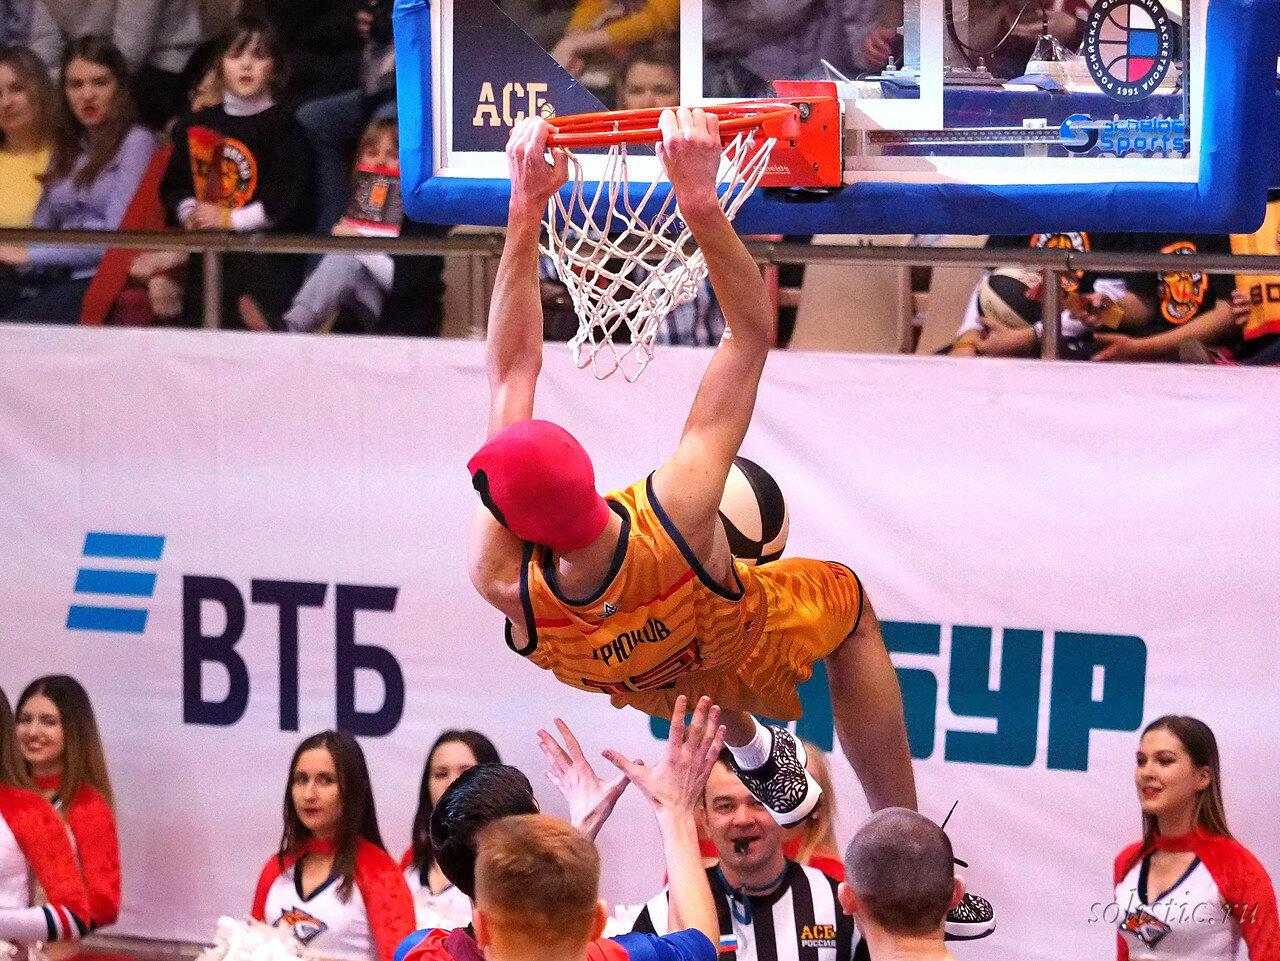 80 Матч звезд АСБ 2018 (ассоциации студенческого баскетбола)